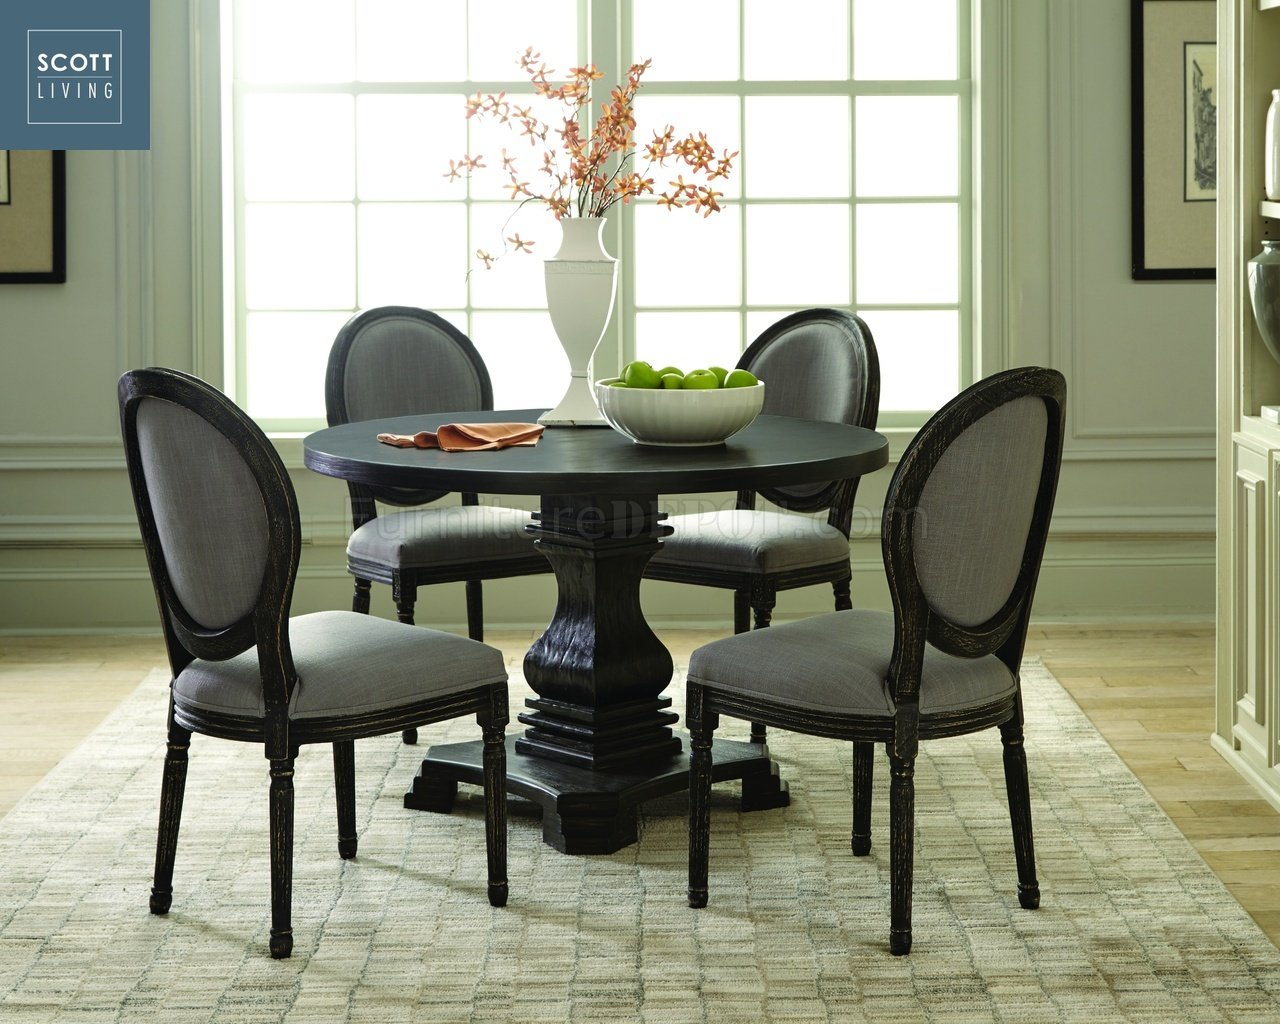 Dayton 107650  Scott Living  Coaster  Antique Black Table